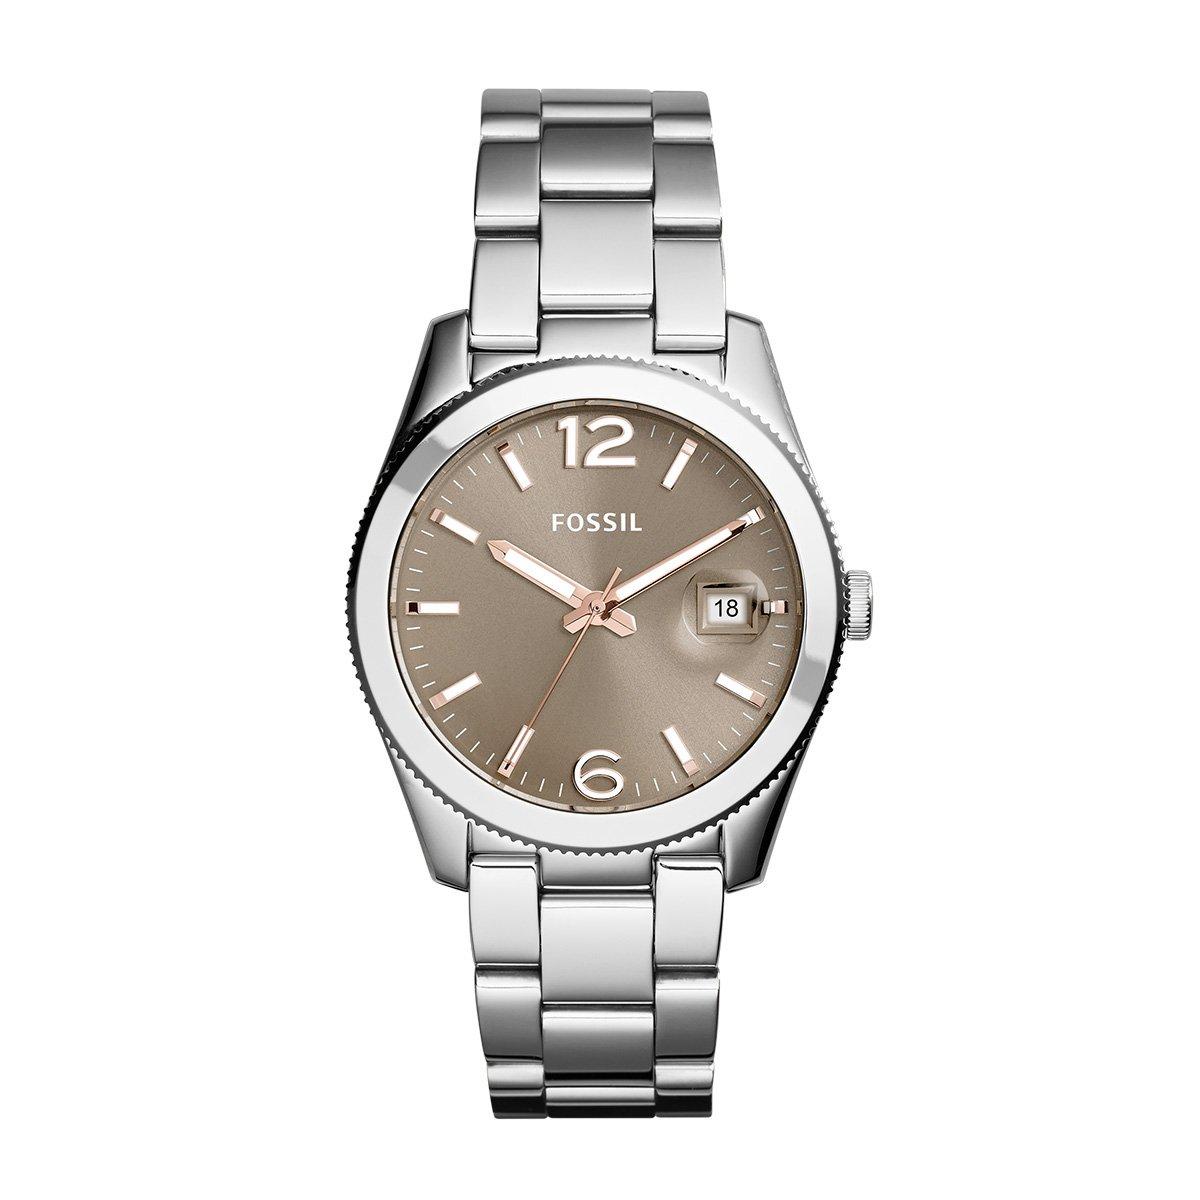 739374661130 reloj fossil mercano libre mexico